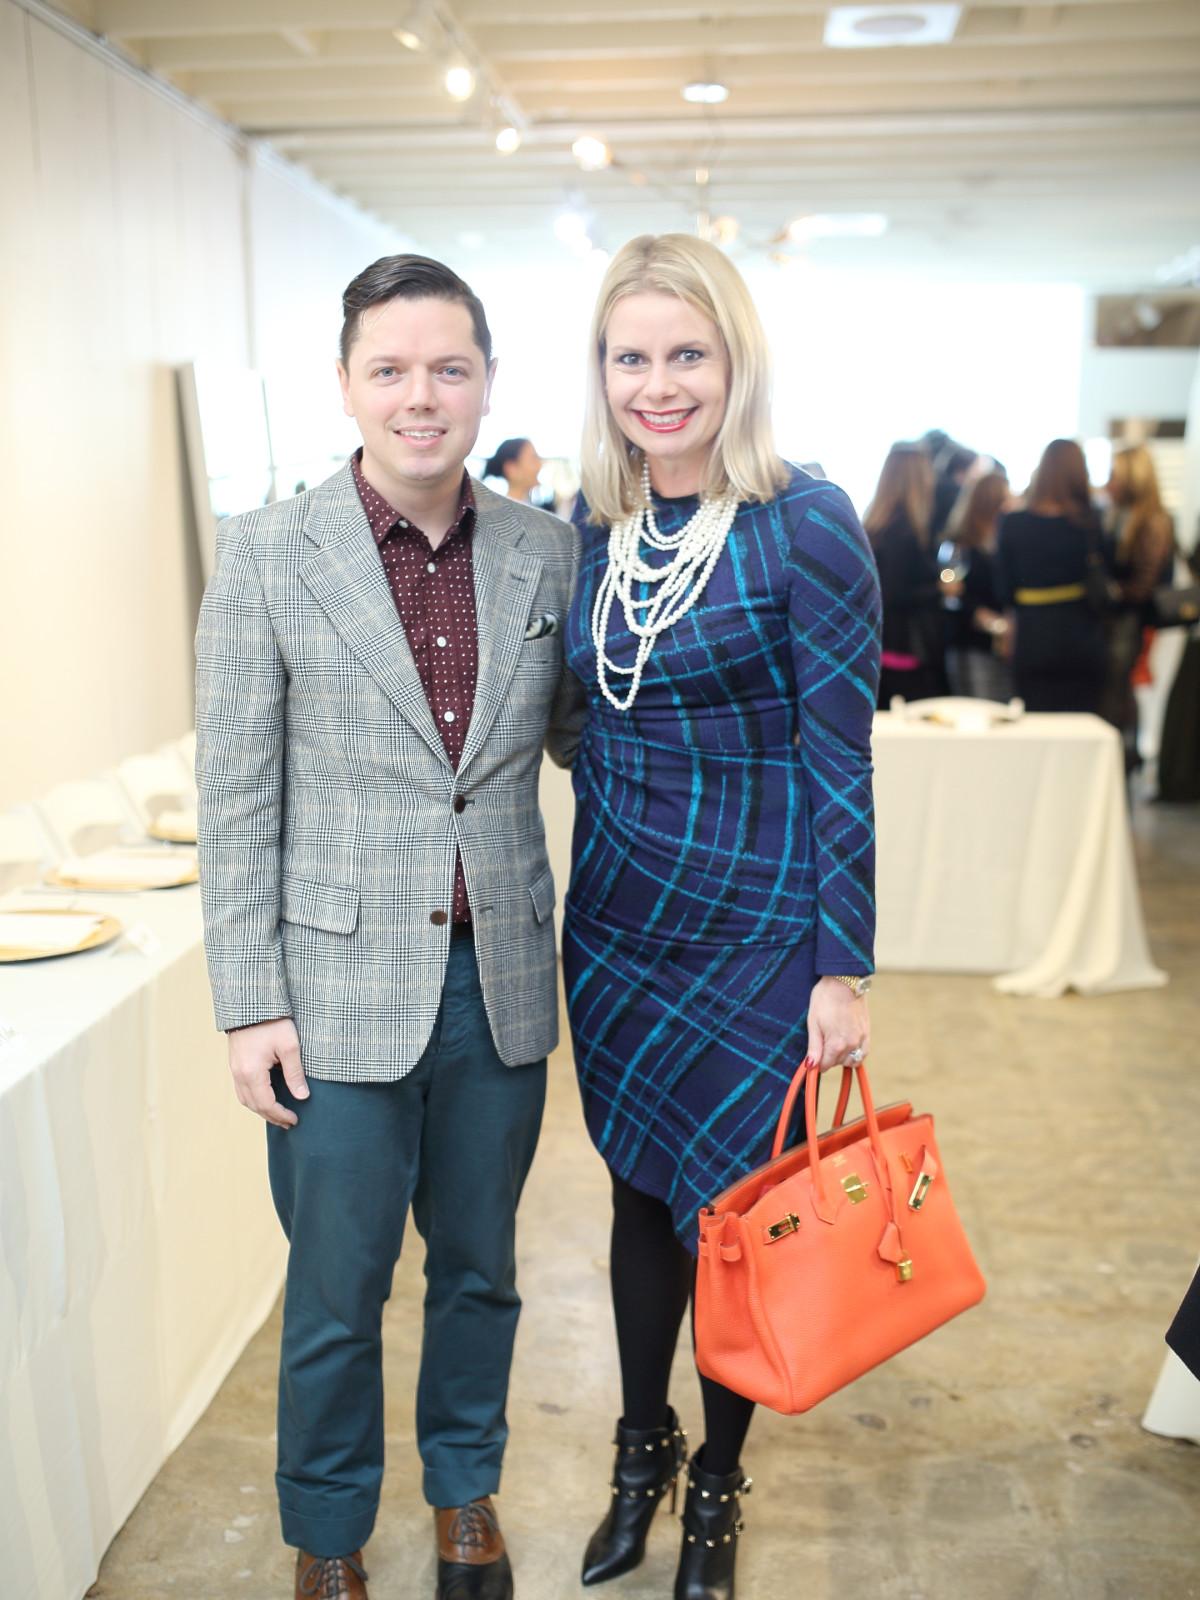 David Peck, Valerie Palmquist Dieterich at Miles David fashion show